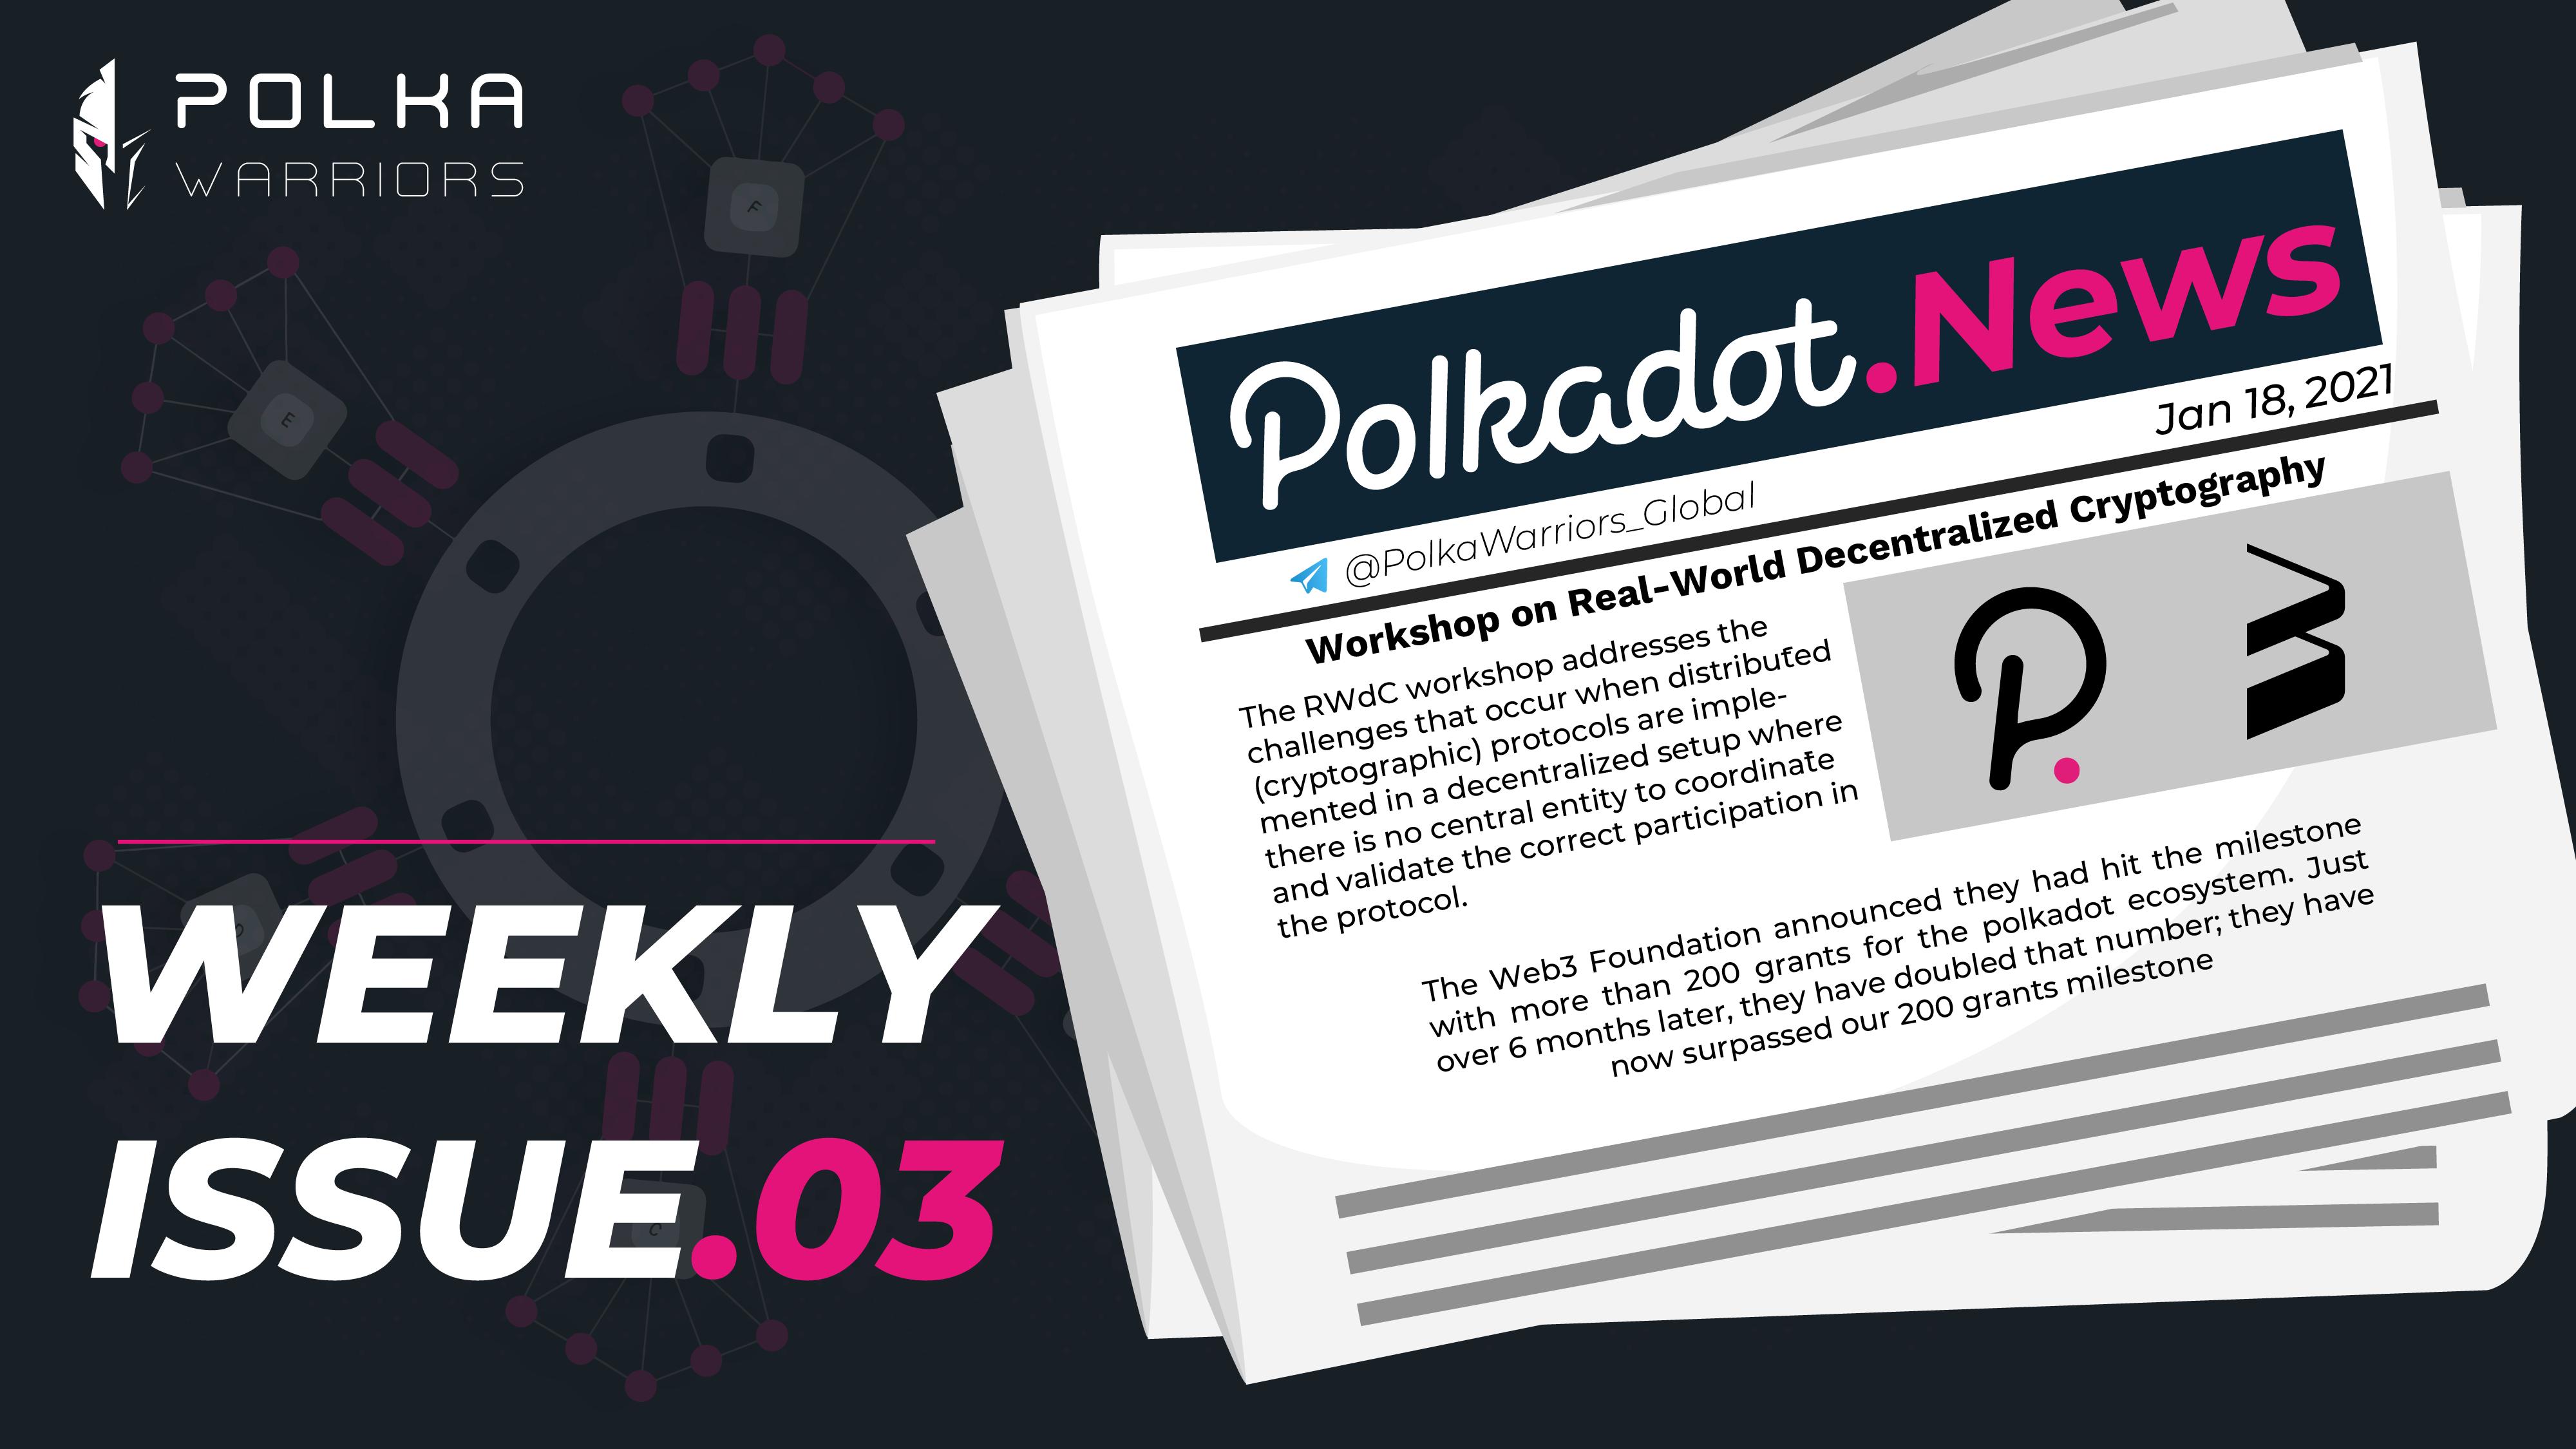 PolkaWarriors Weekly Issue.(dot)3 - top 4 coinmarketcap - syndicator